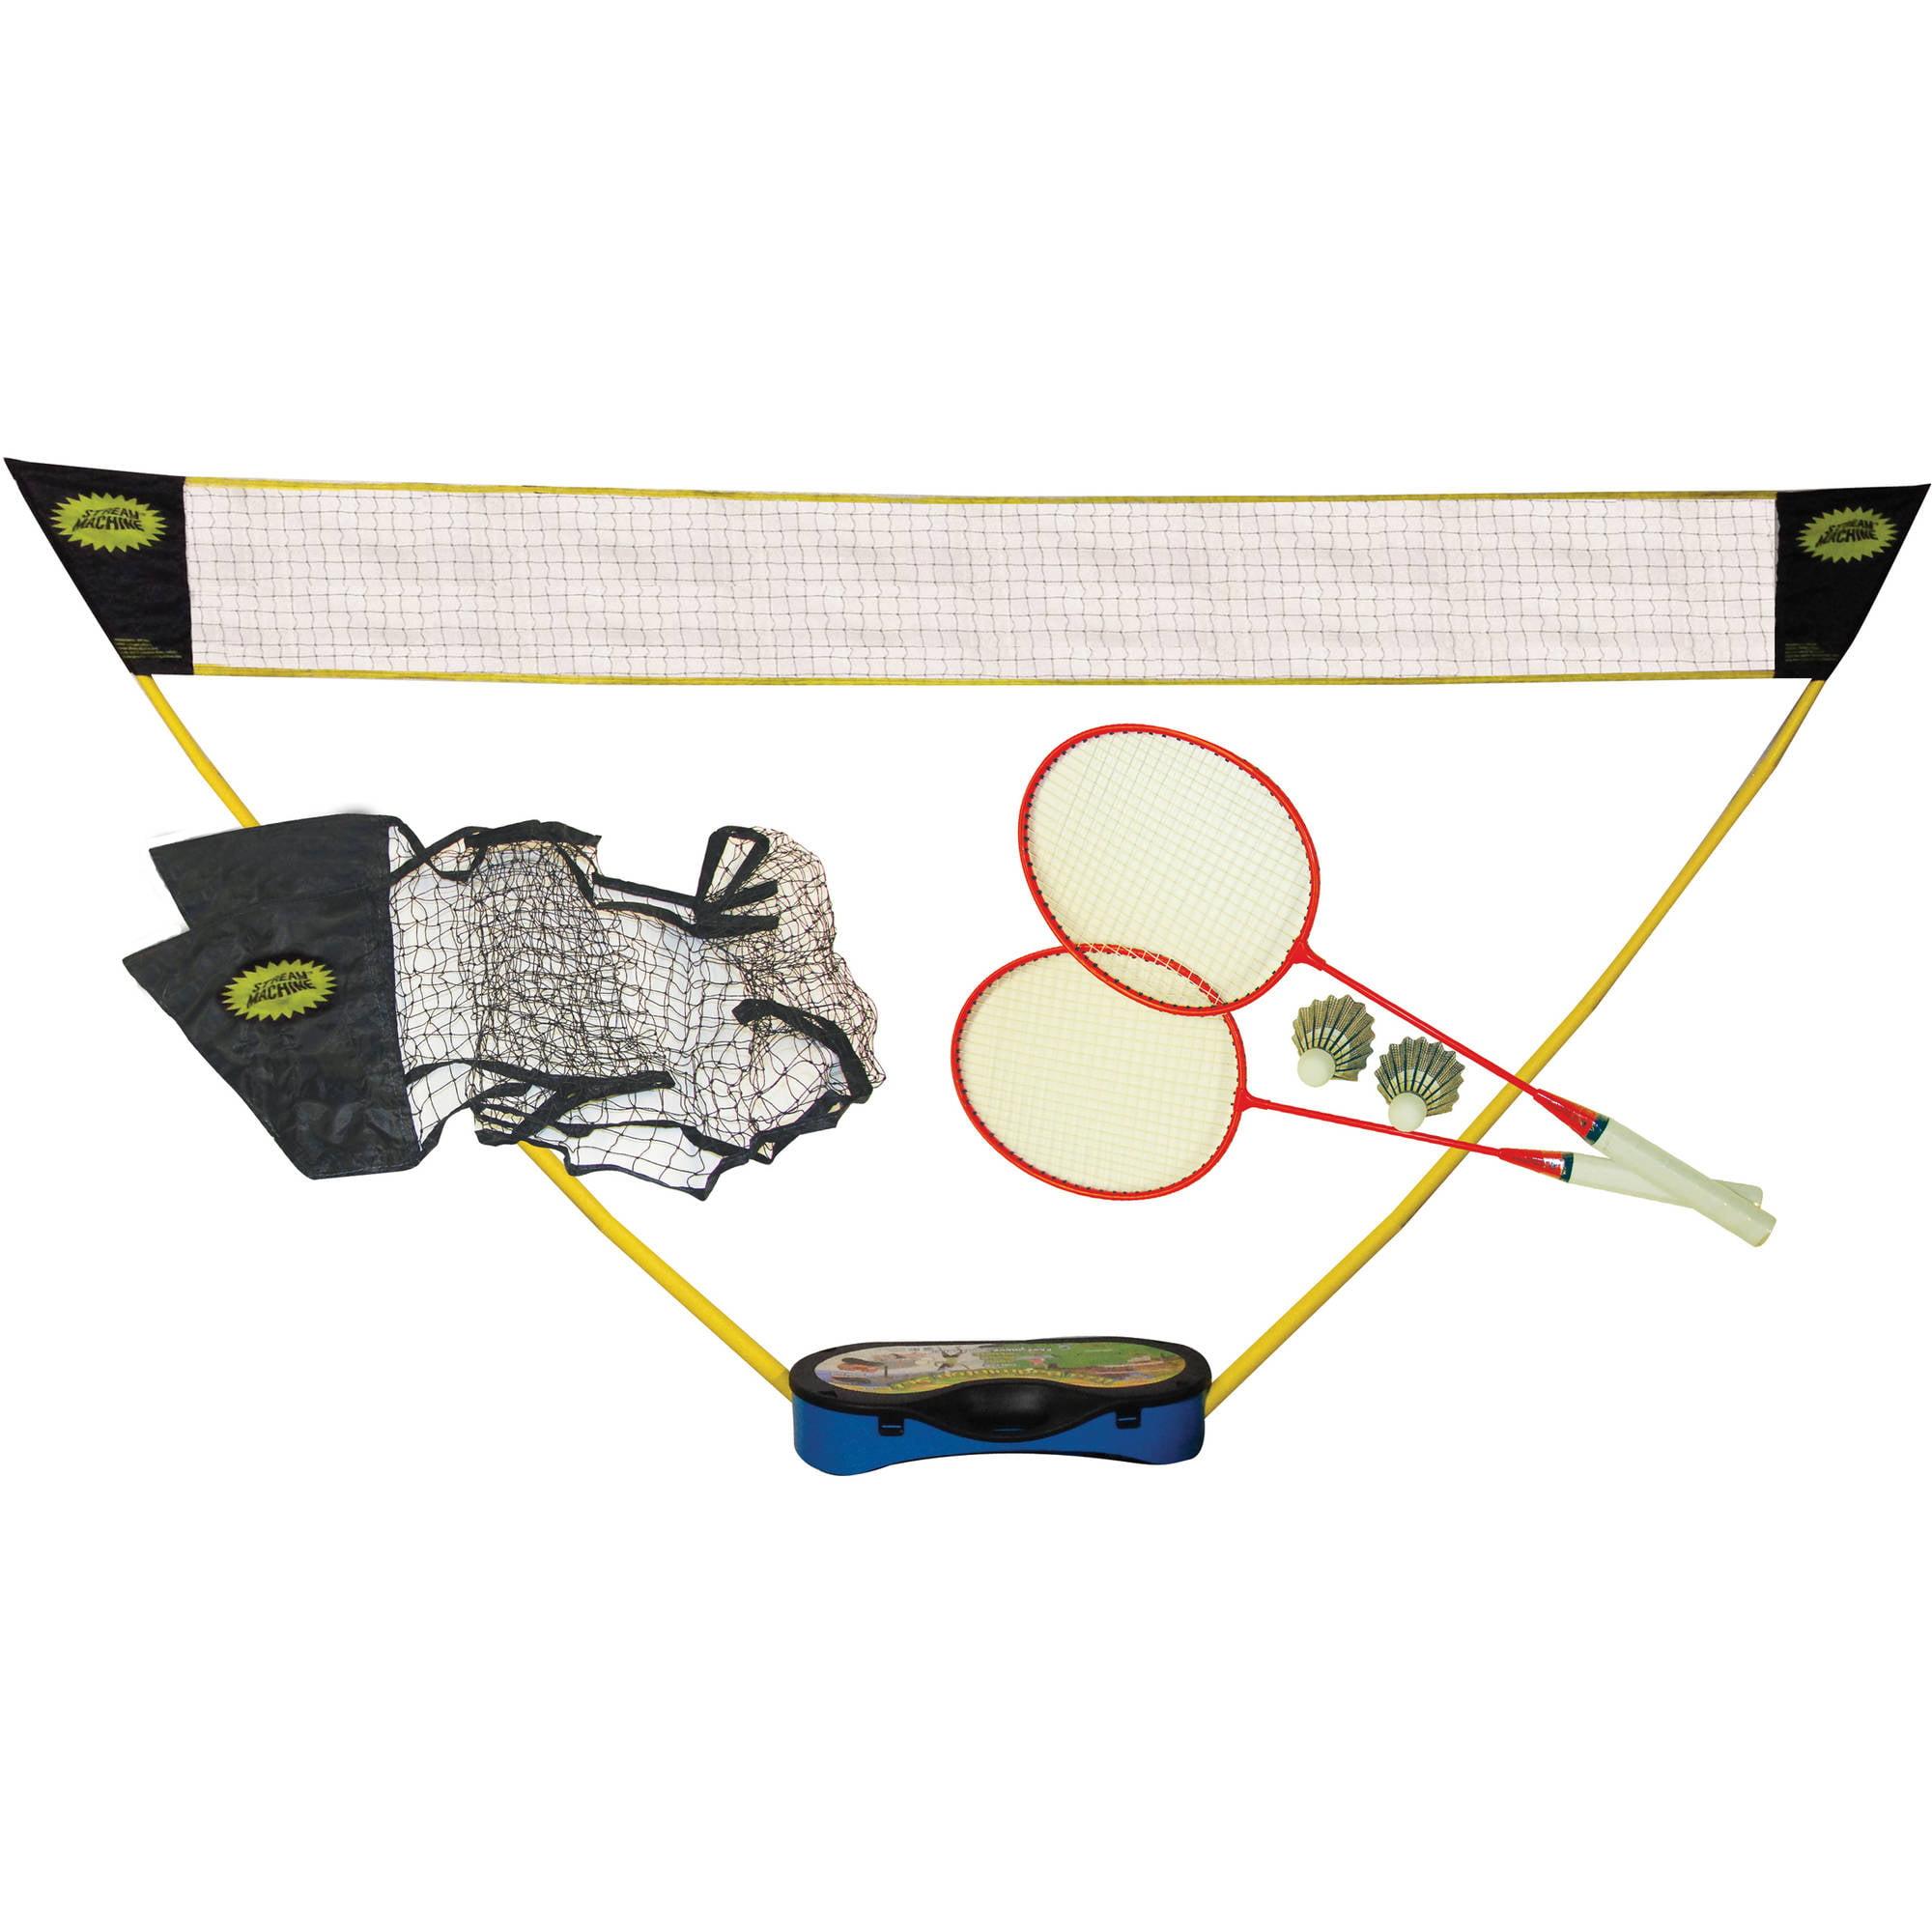 Water Sports Itza Badminton Set by Water Sports